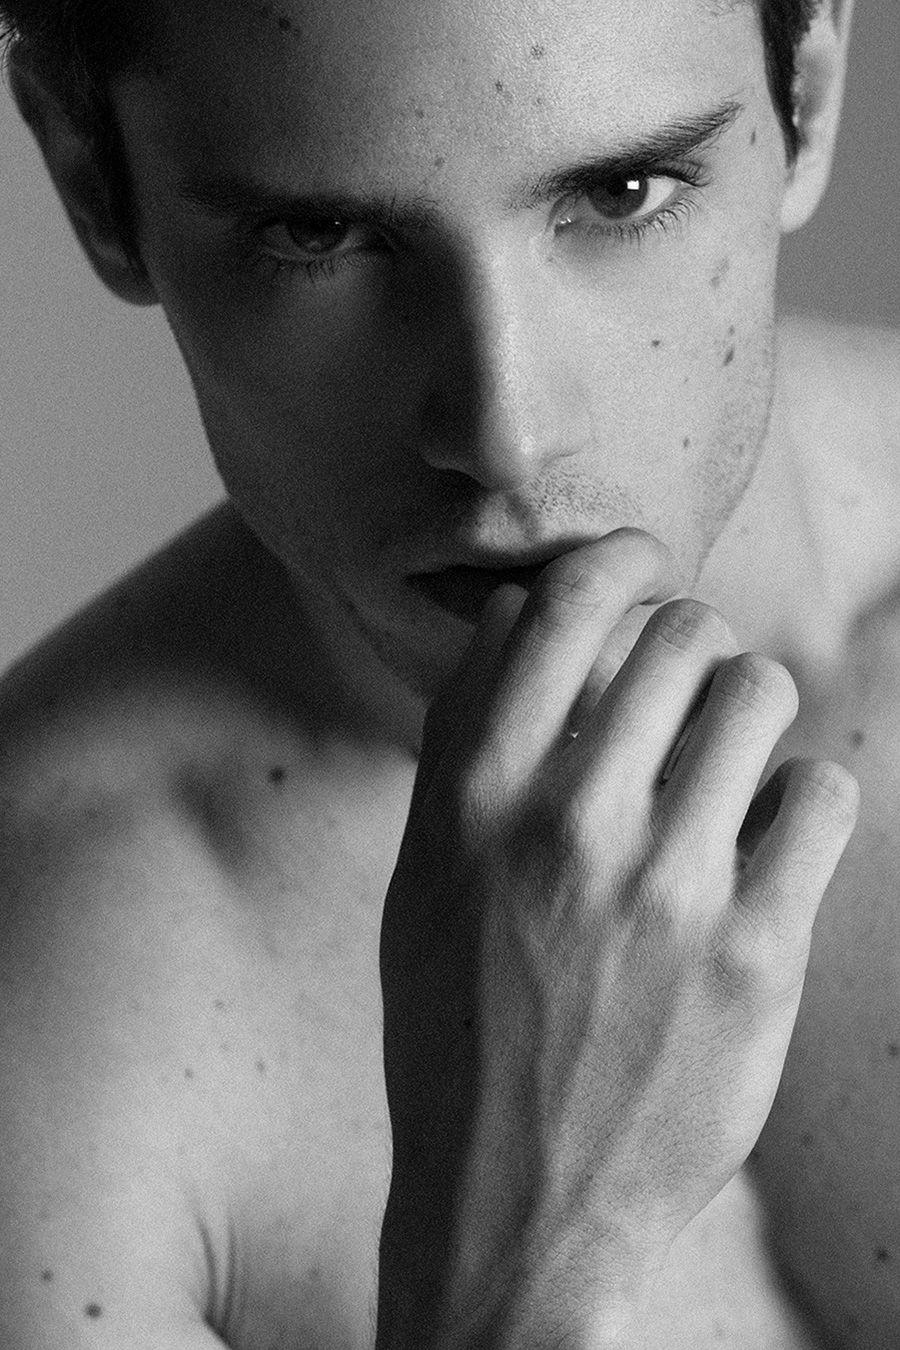 Diego Barrueco | Photographed by Edwin S Freyer